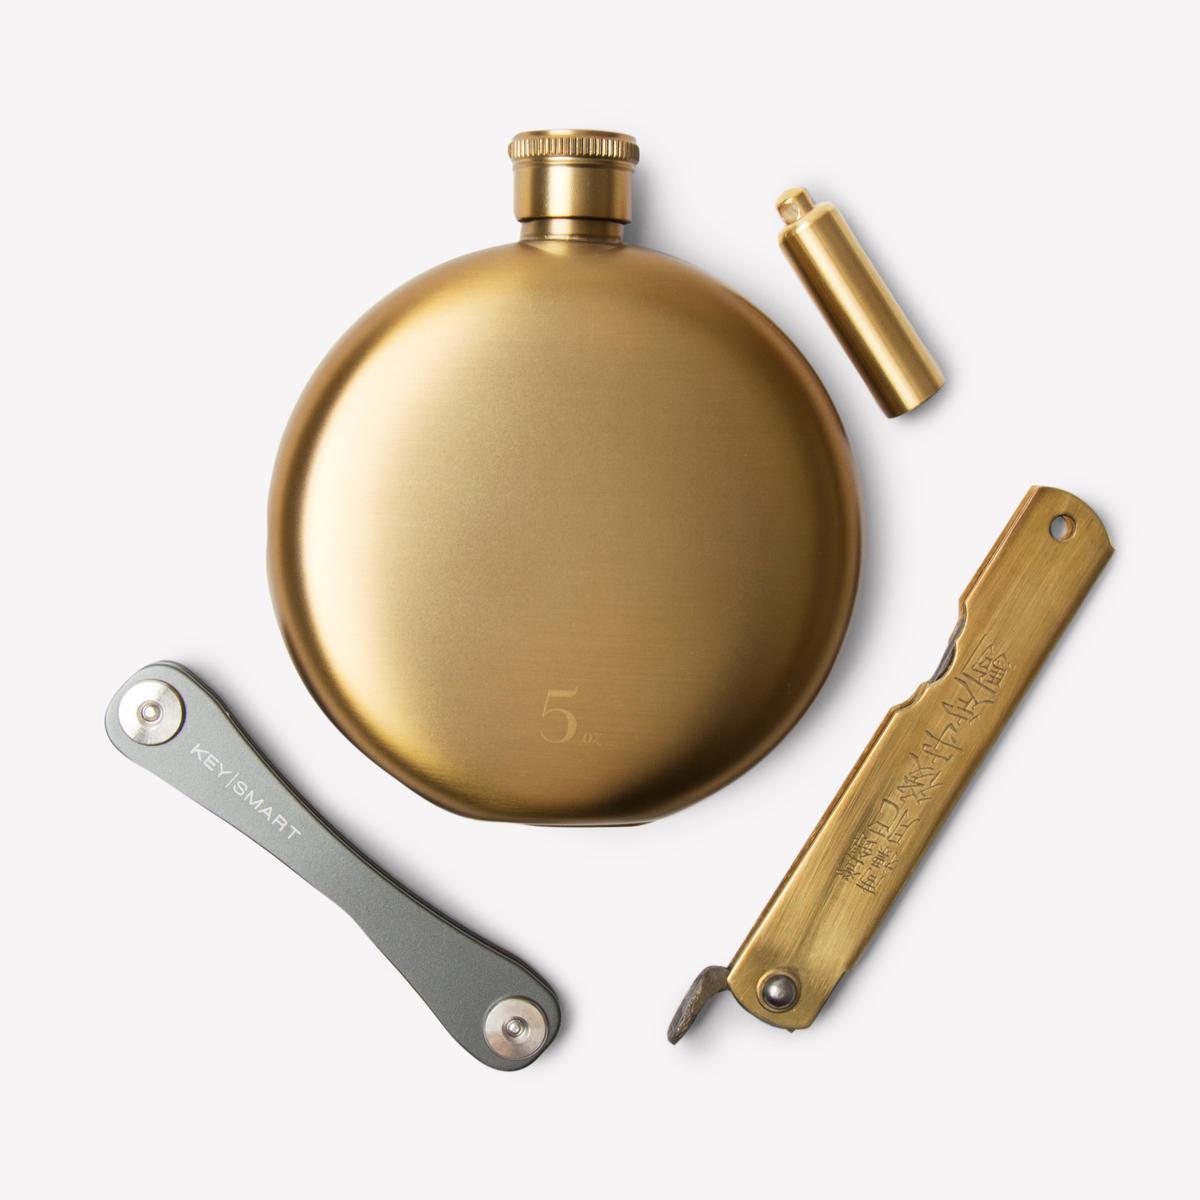 stay-gold-supply-kit.jpg